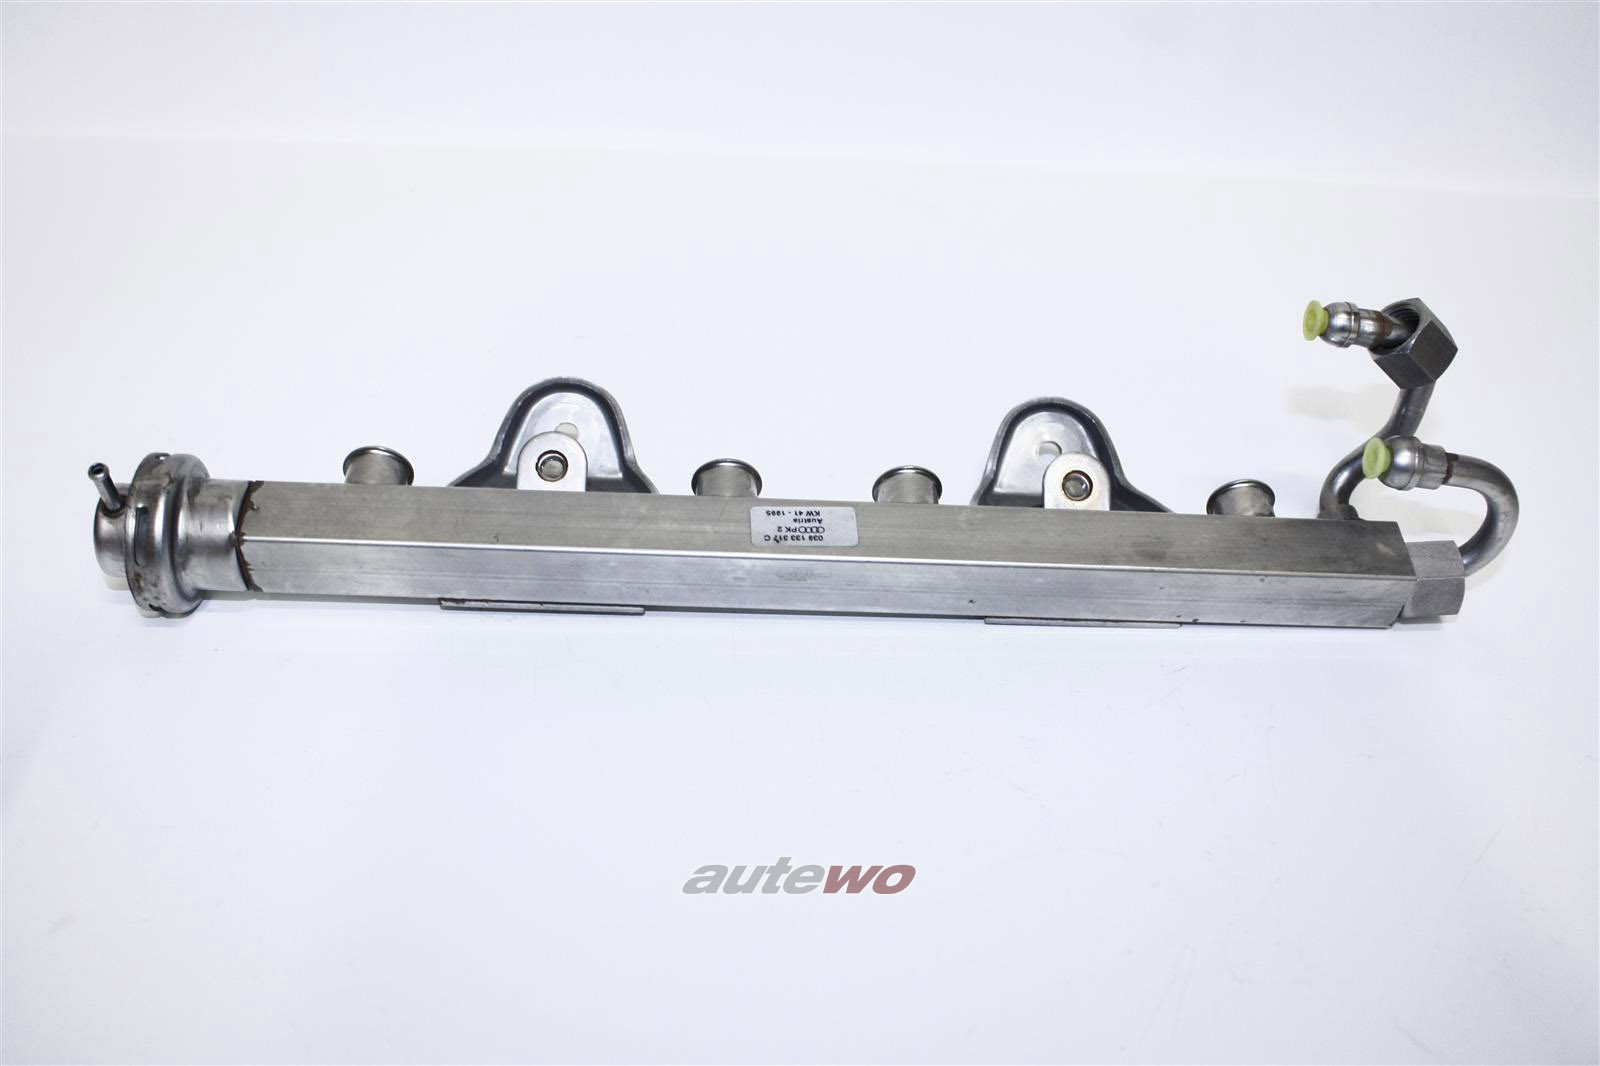 039133317C 037133035C NEU Audi/VW 80 B4/Coupe/Cabrio 89 Einspritzleiste